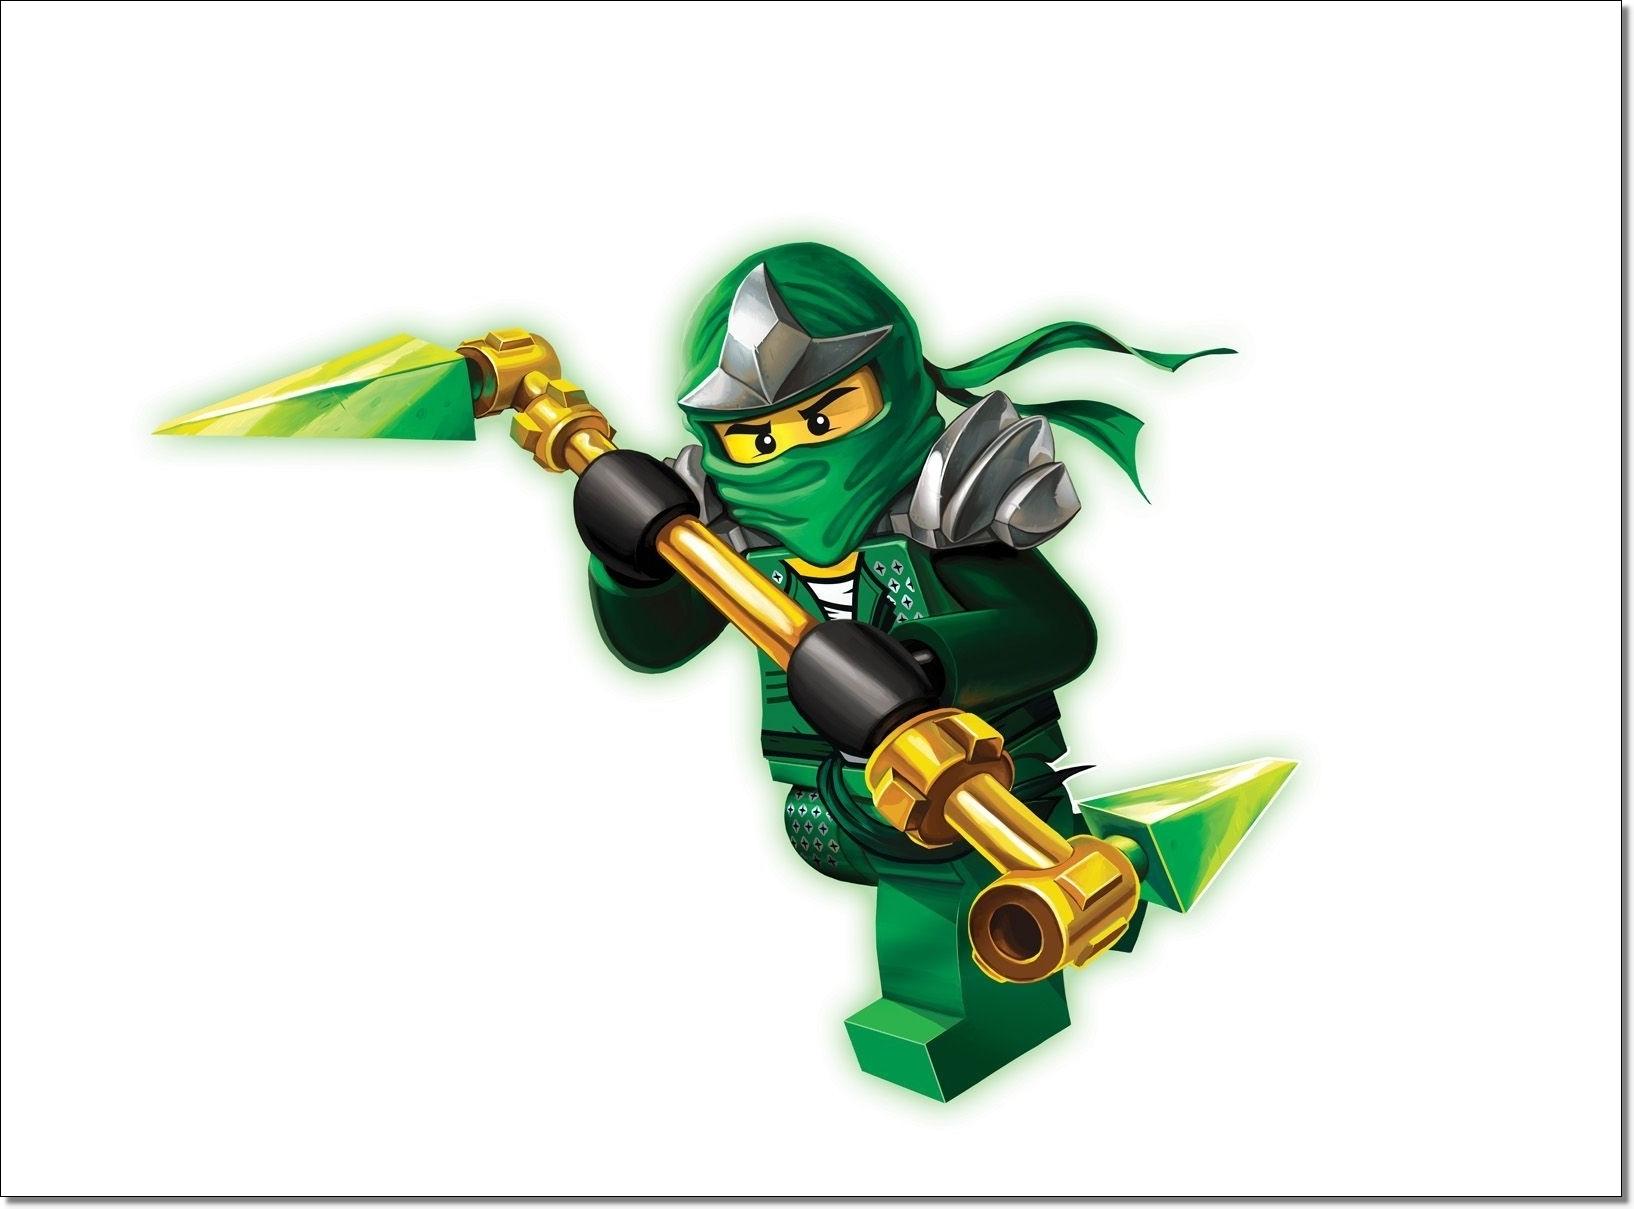 Lego clipart green Clipartwork Clipart Lego Clipart #4498